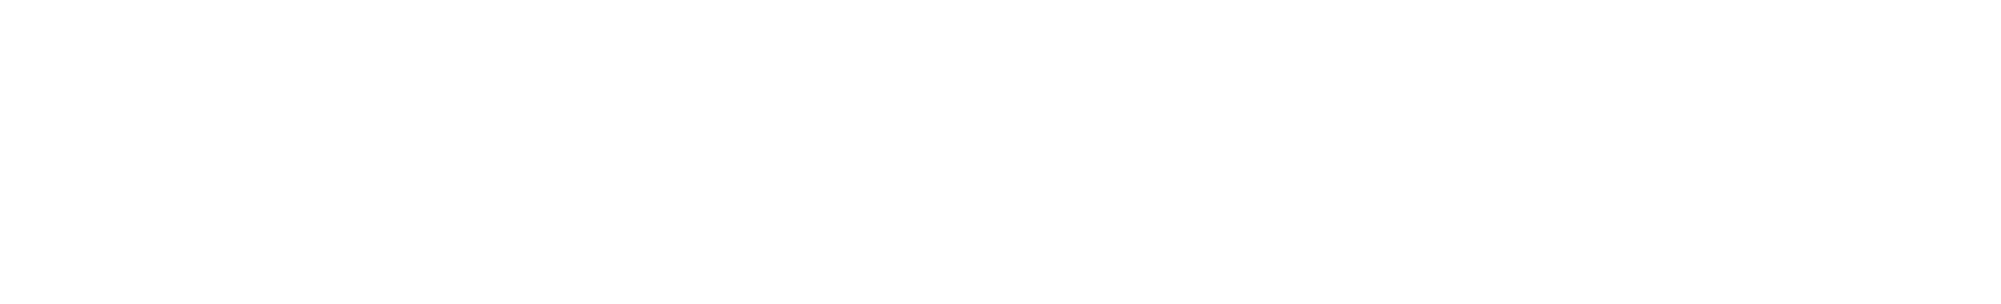 brandiIntelligence-header